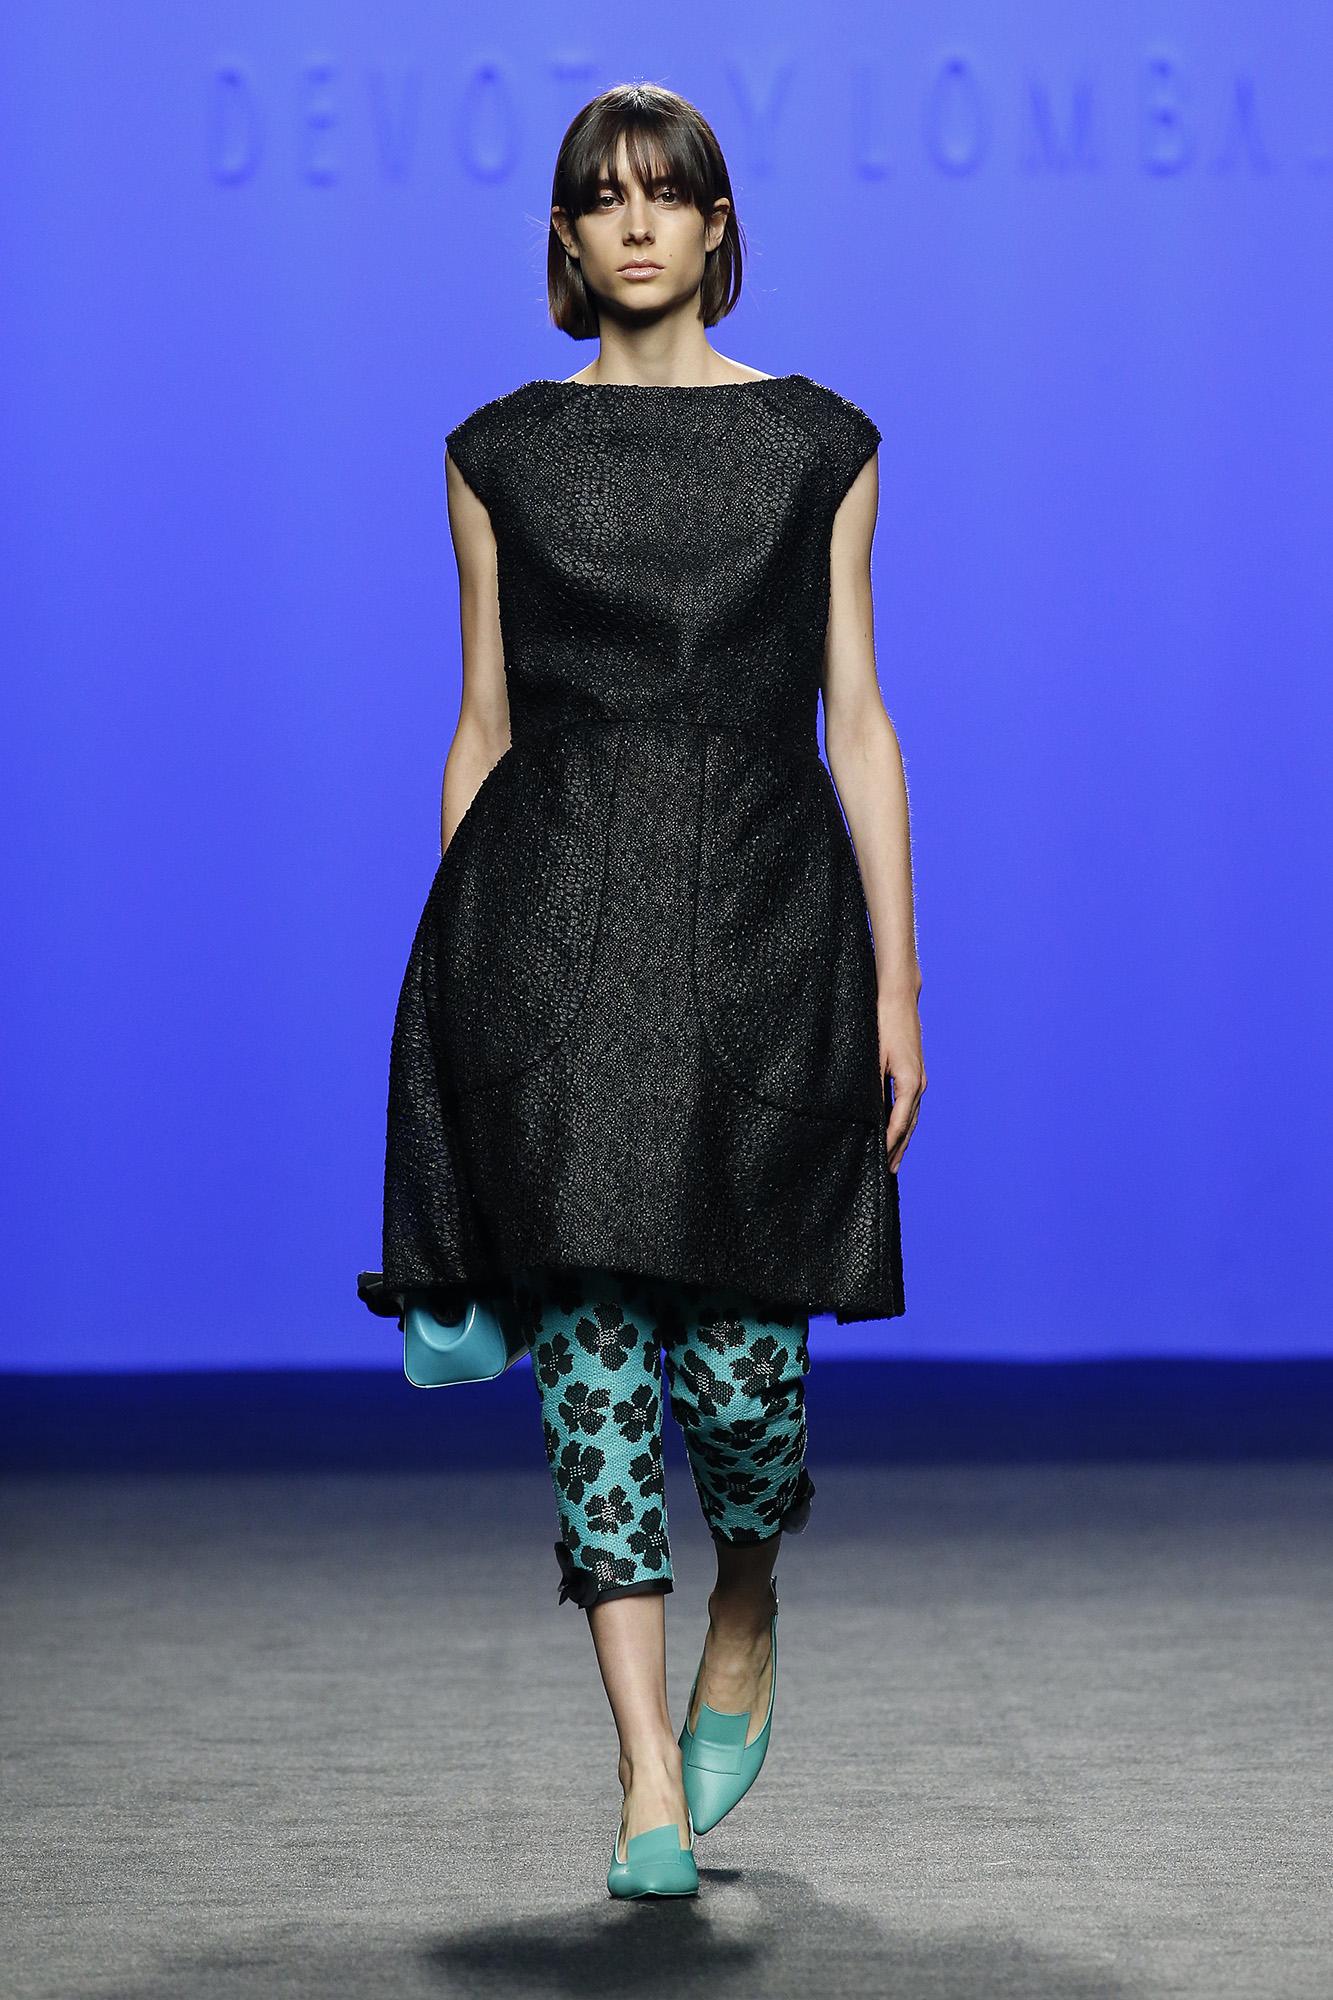 Vestido negro texturado